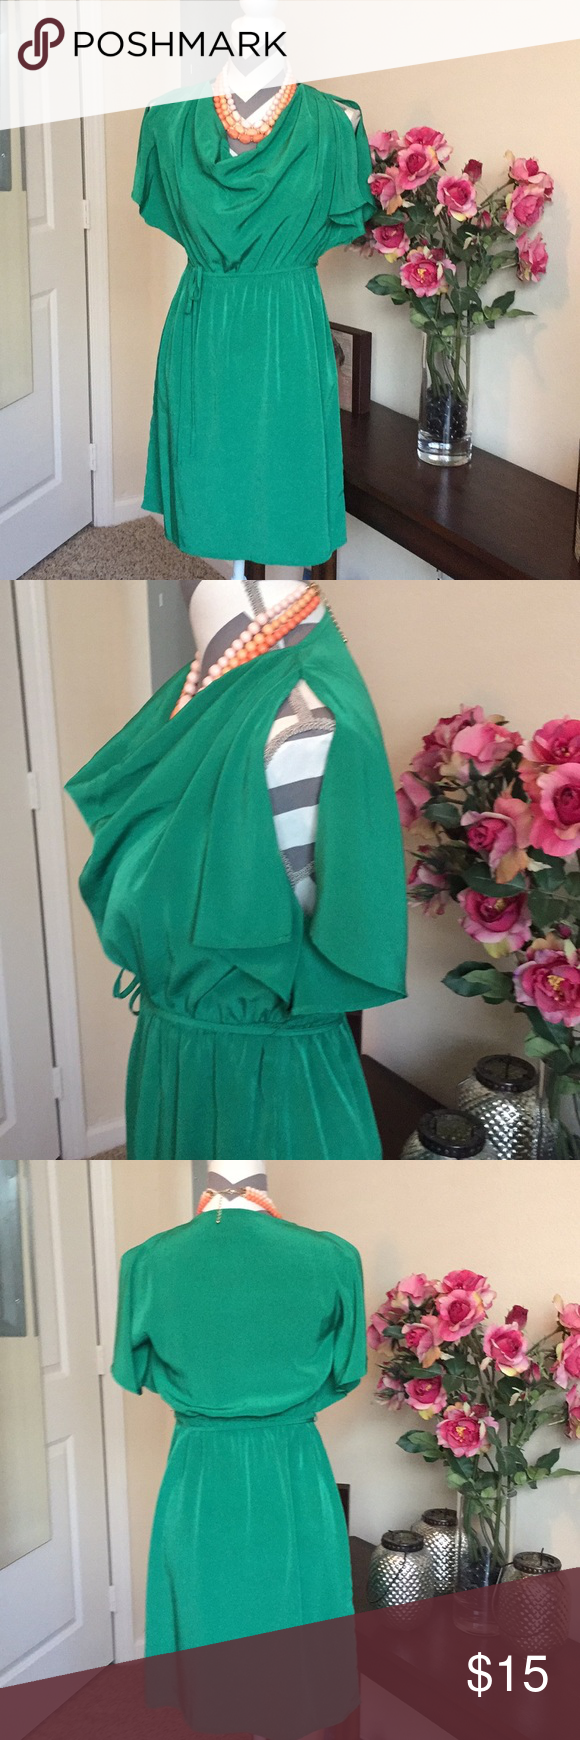 Mossimo For Target Green Dress Green Dress Target Dresses Clothes Design [ 1740 x 580 Pixel ]